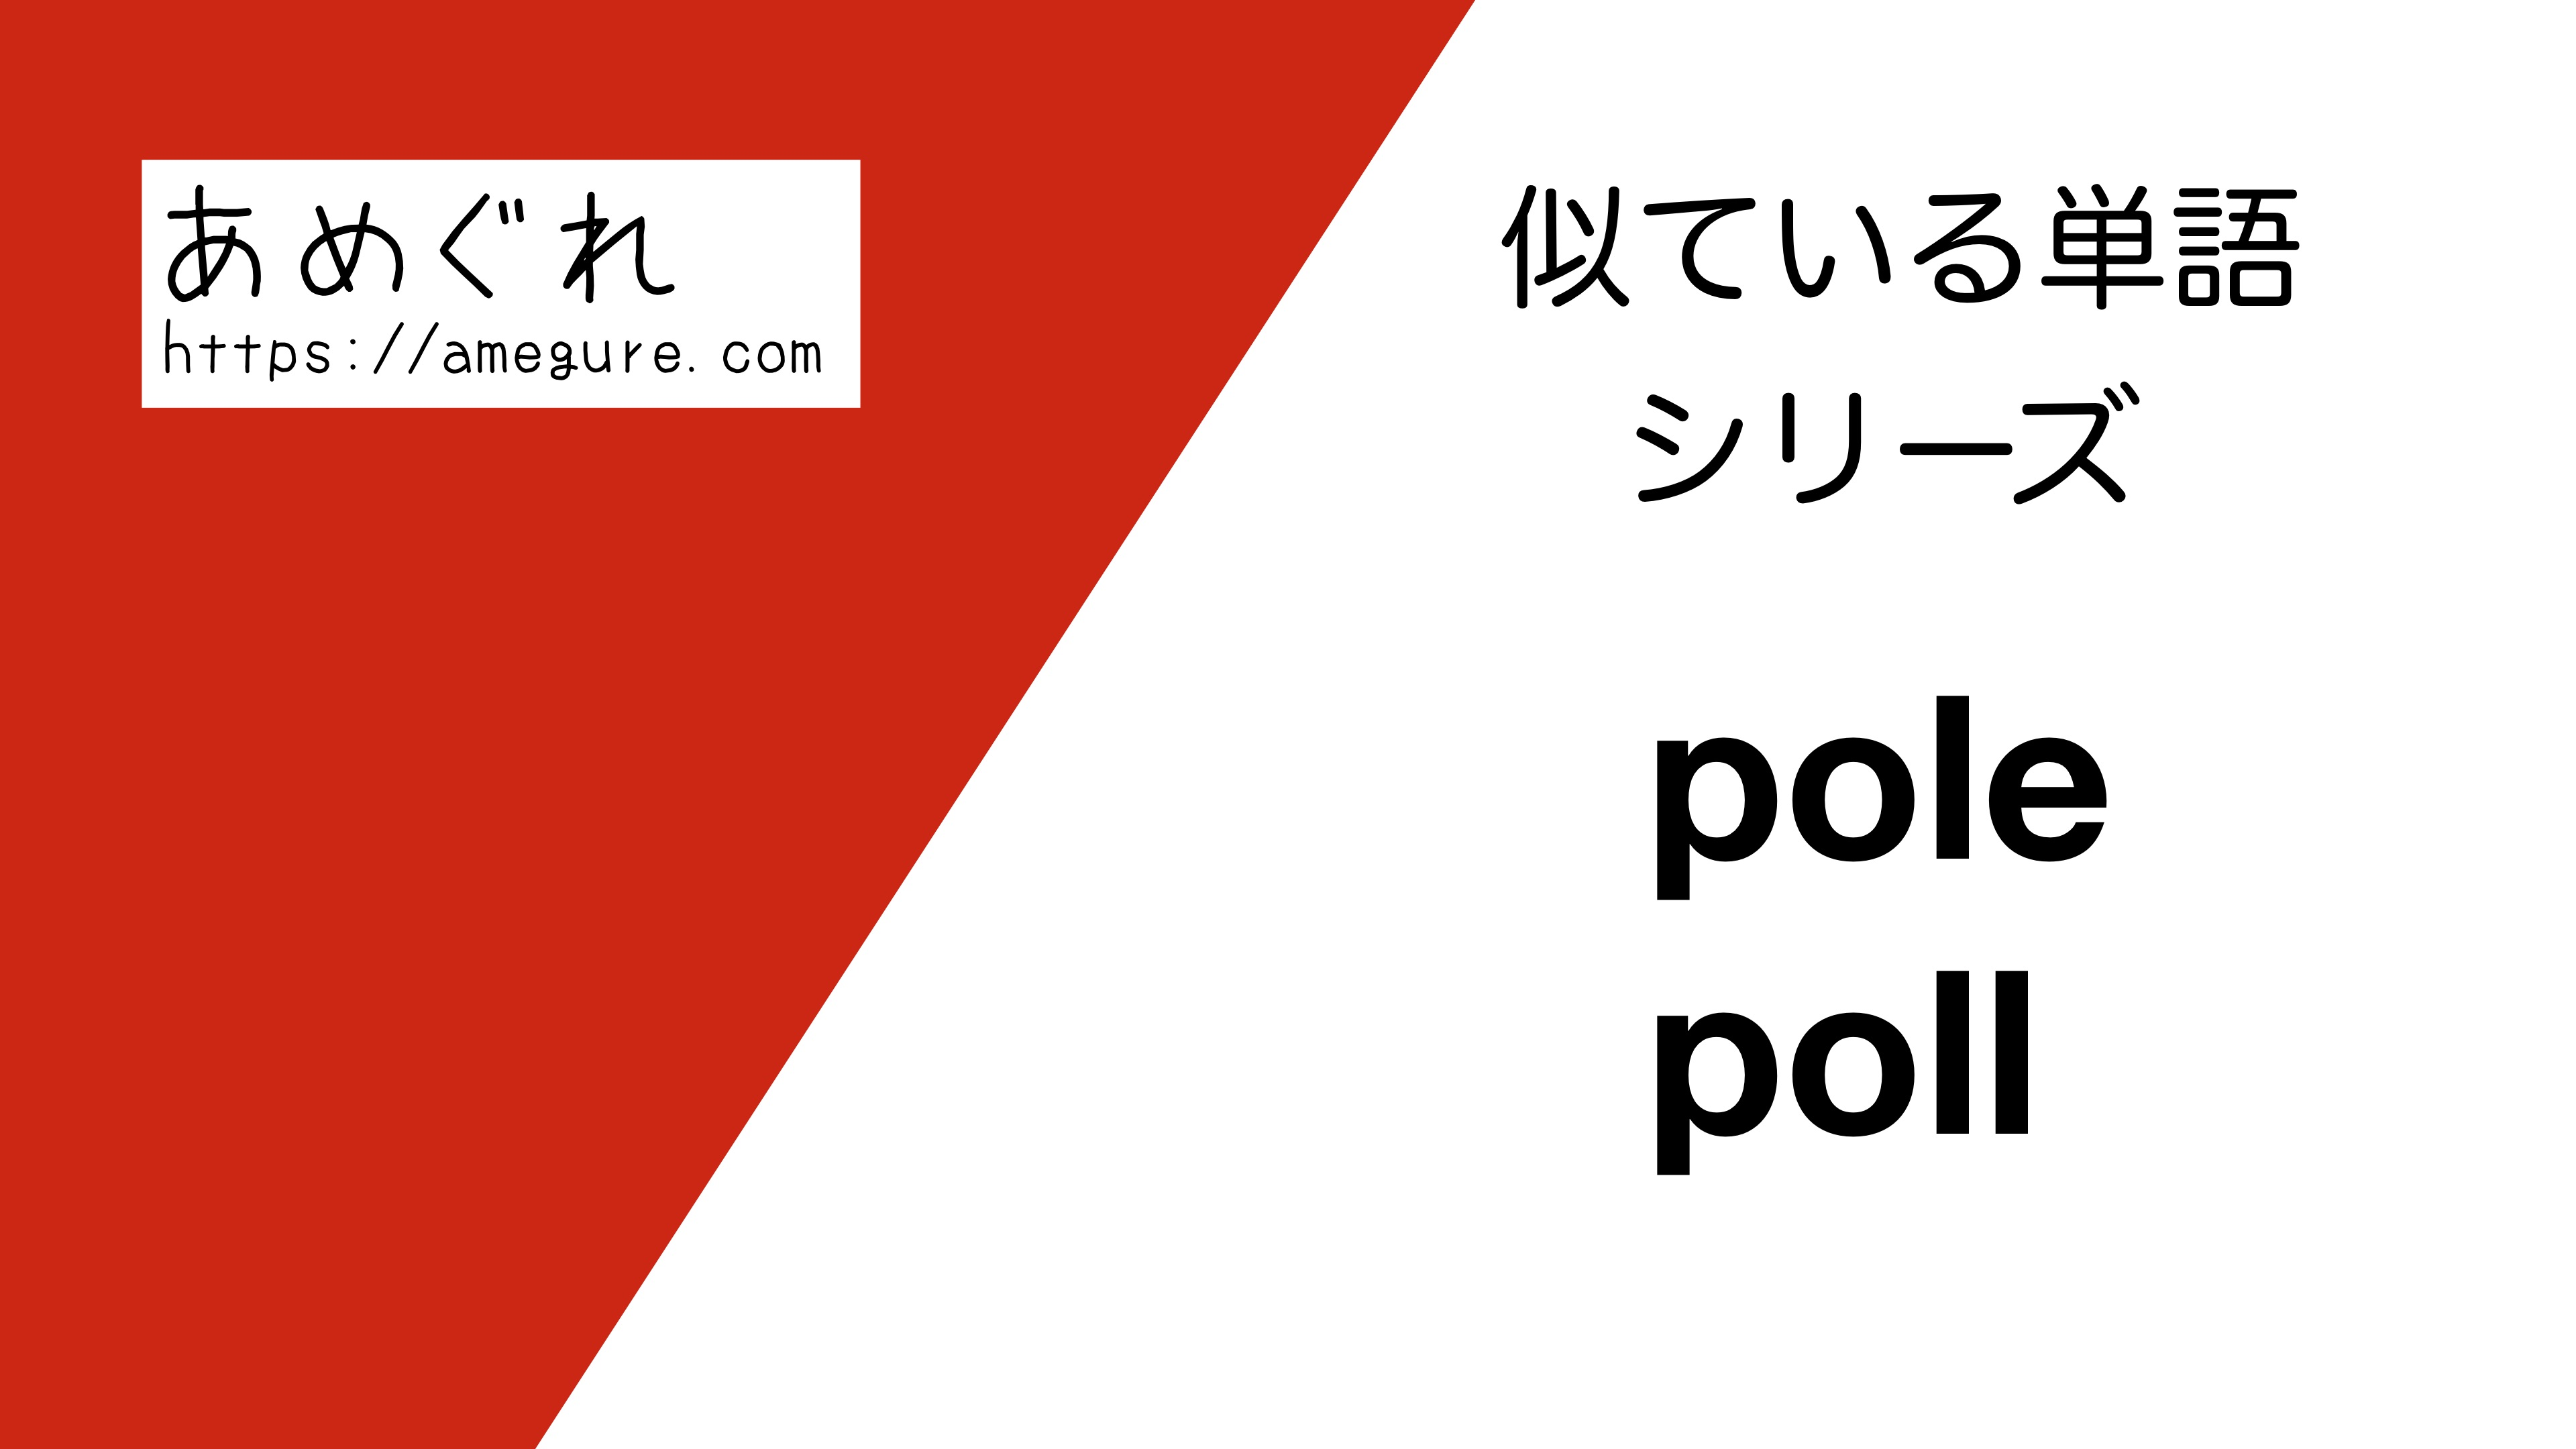 pole-poll違い